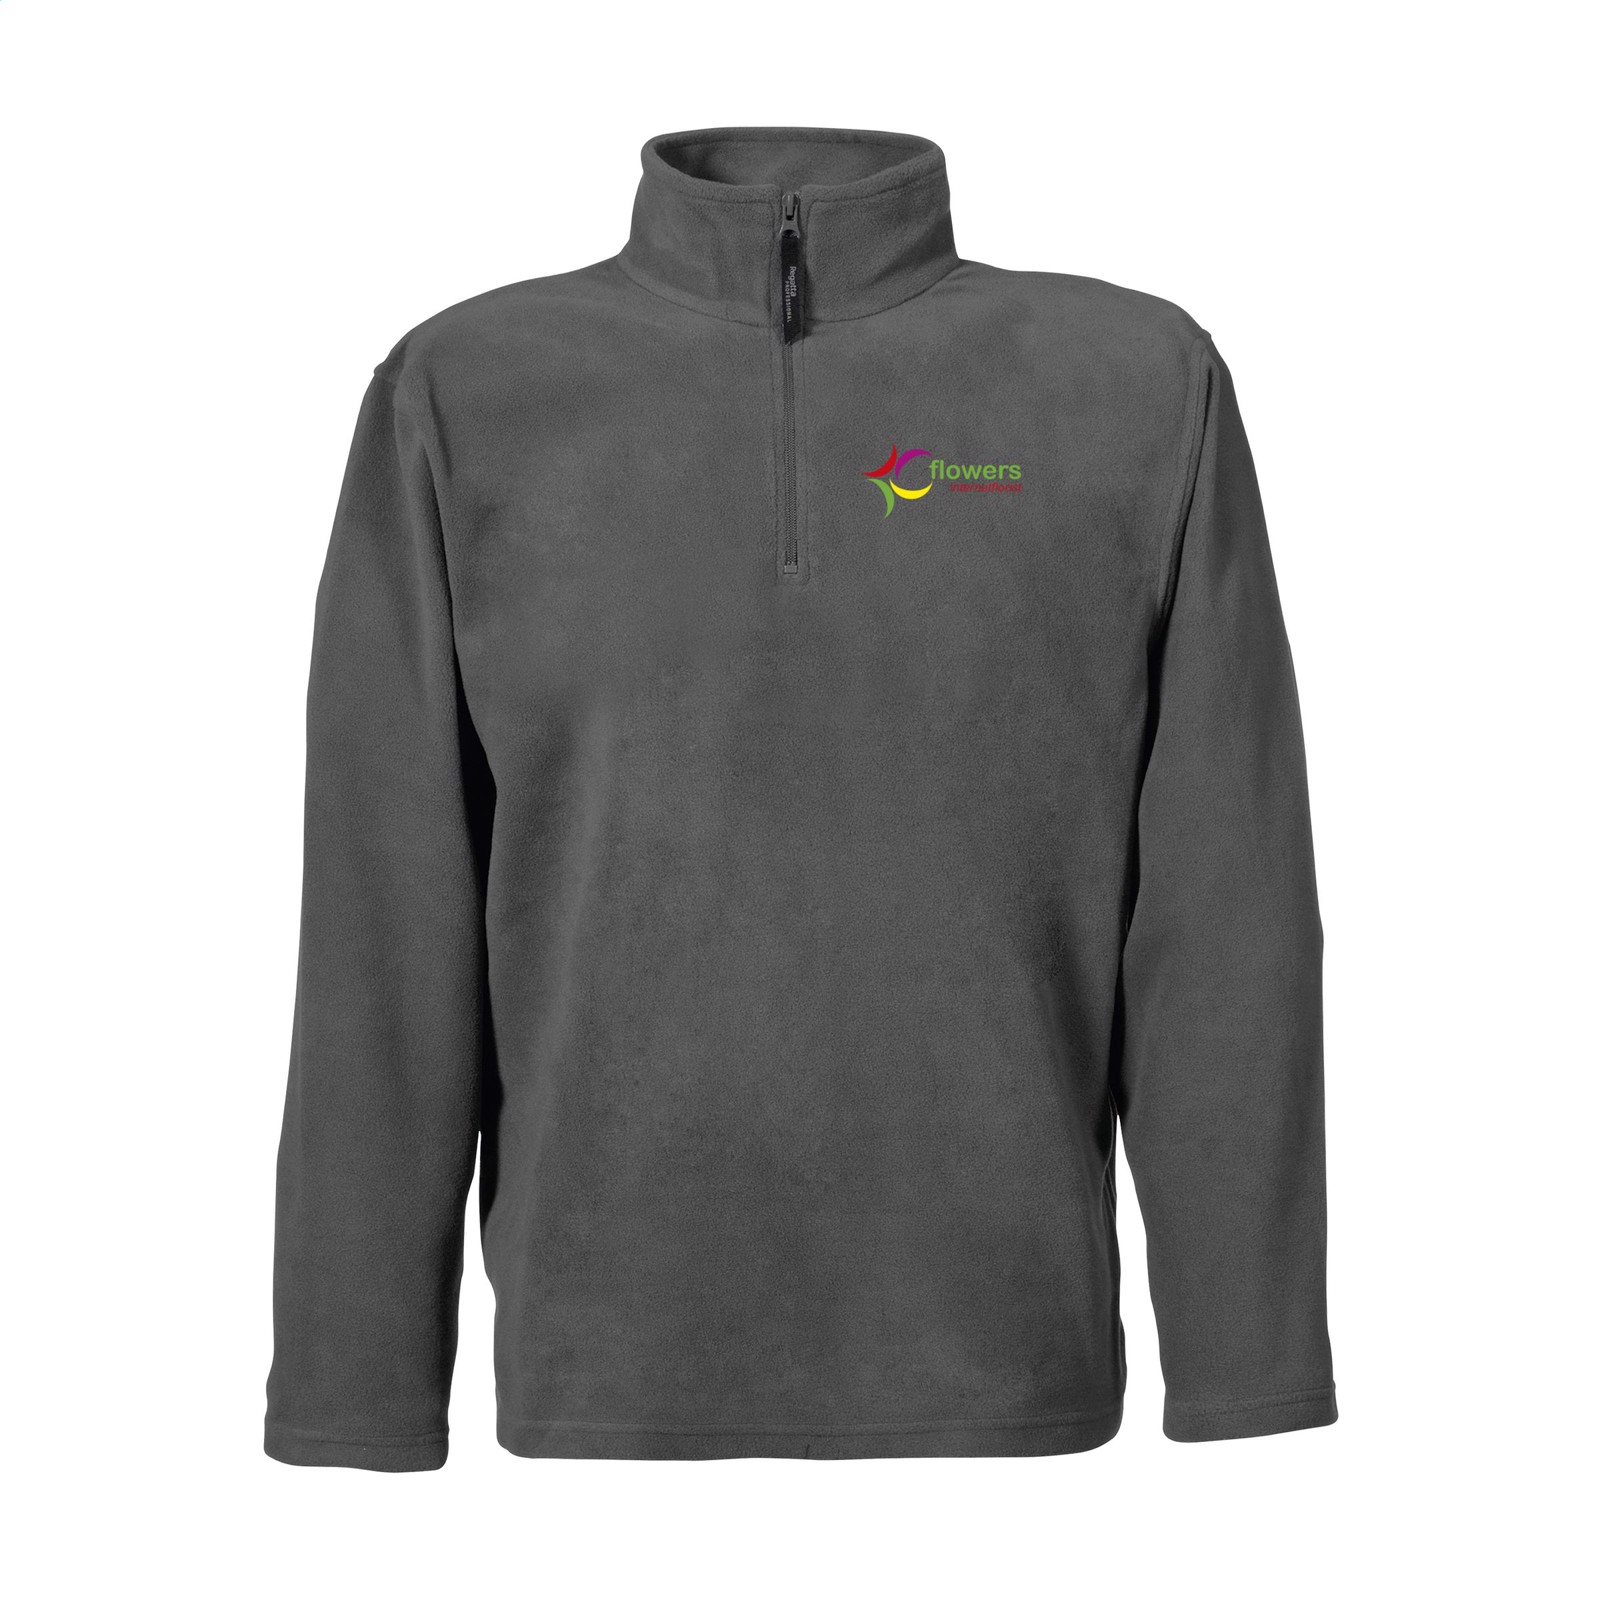 Regatta Micro Zip Neck Fleece Sweater Mens - Grey / 4XL